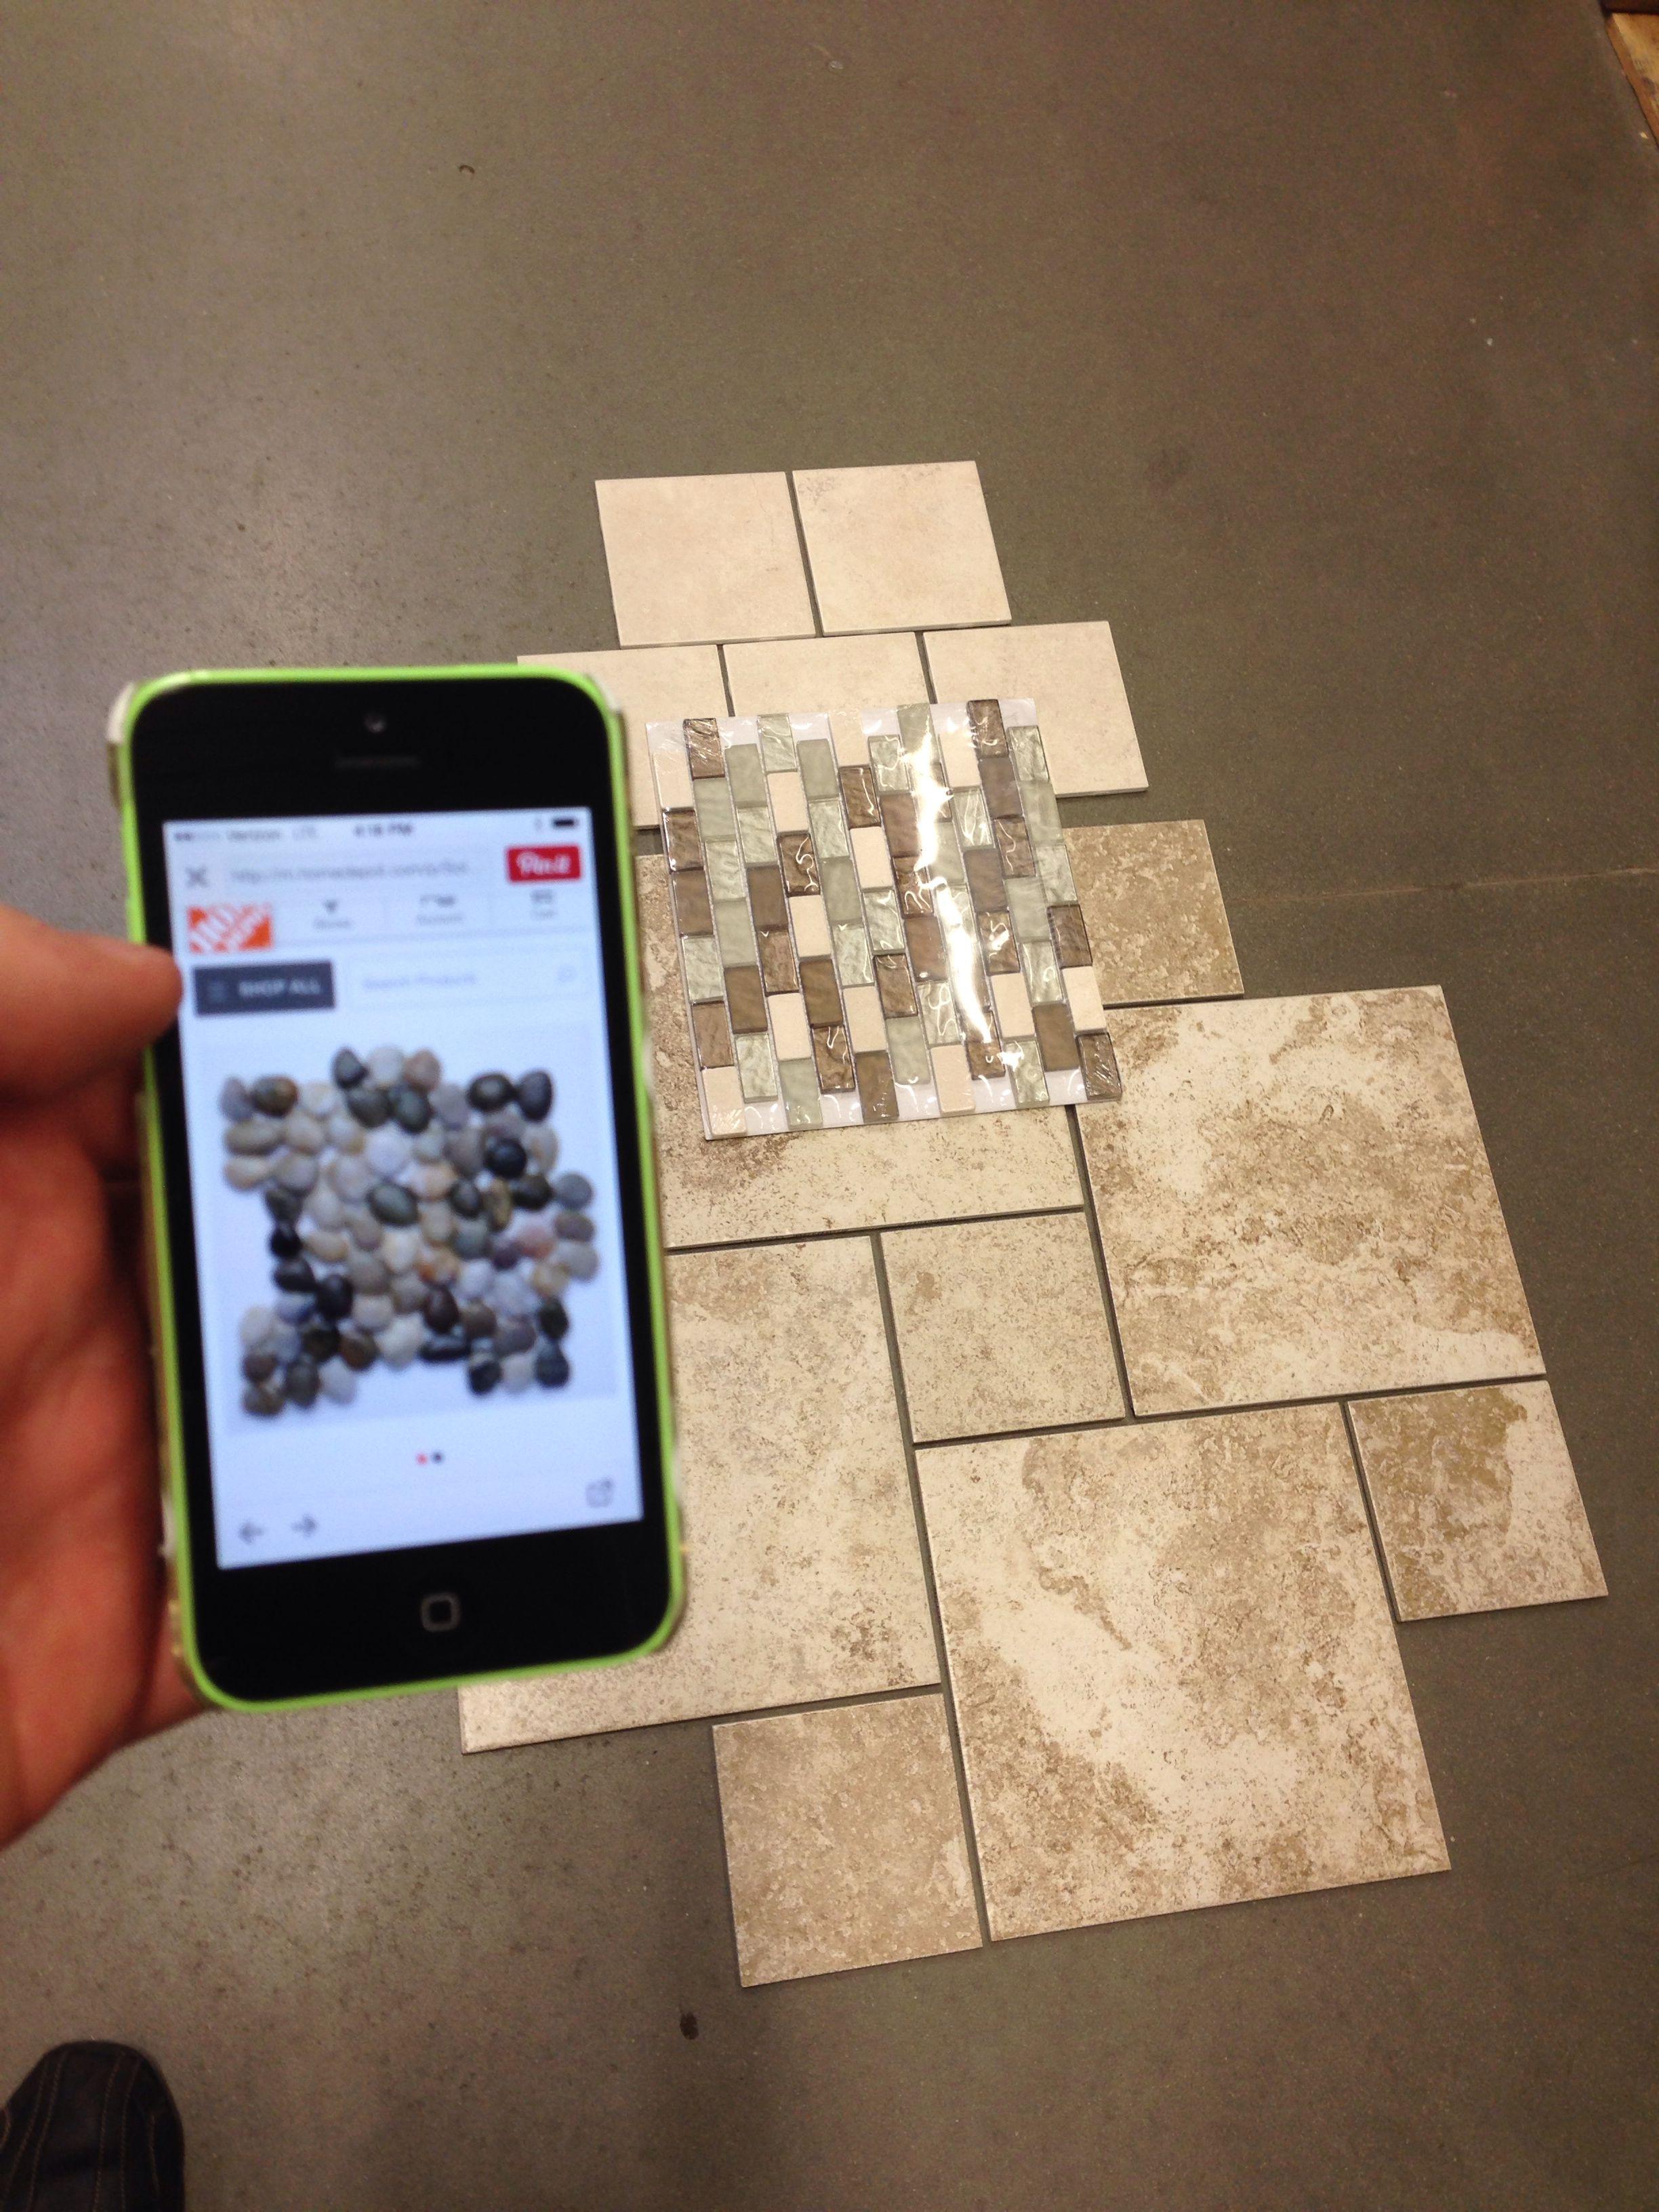 Master bath floor 12x12 and 6x6 in a hopscotch pattern for Bathroom designs 12x12